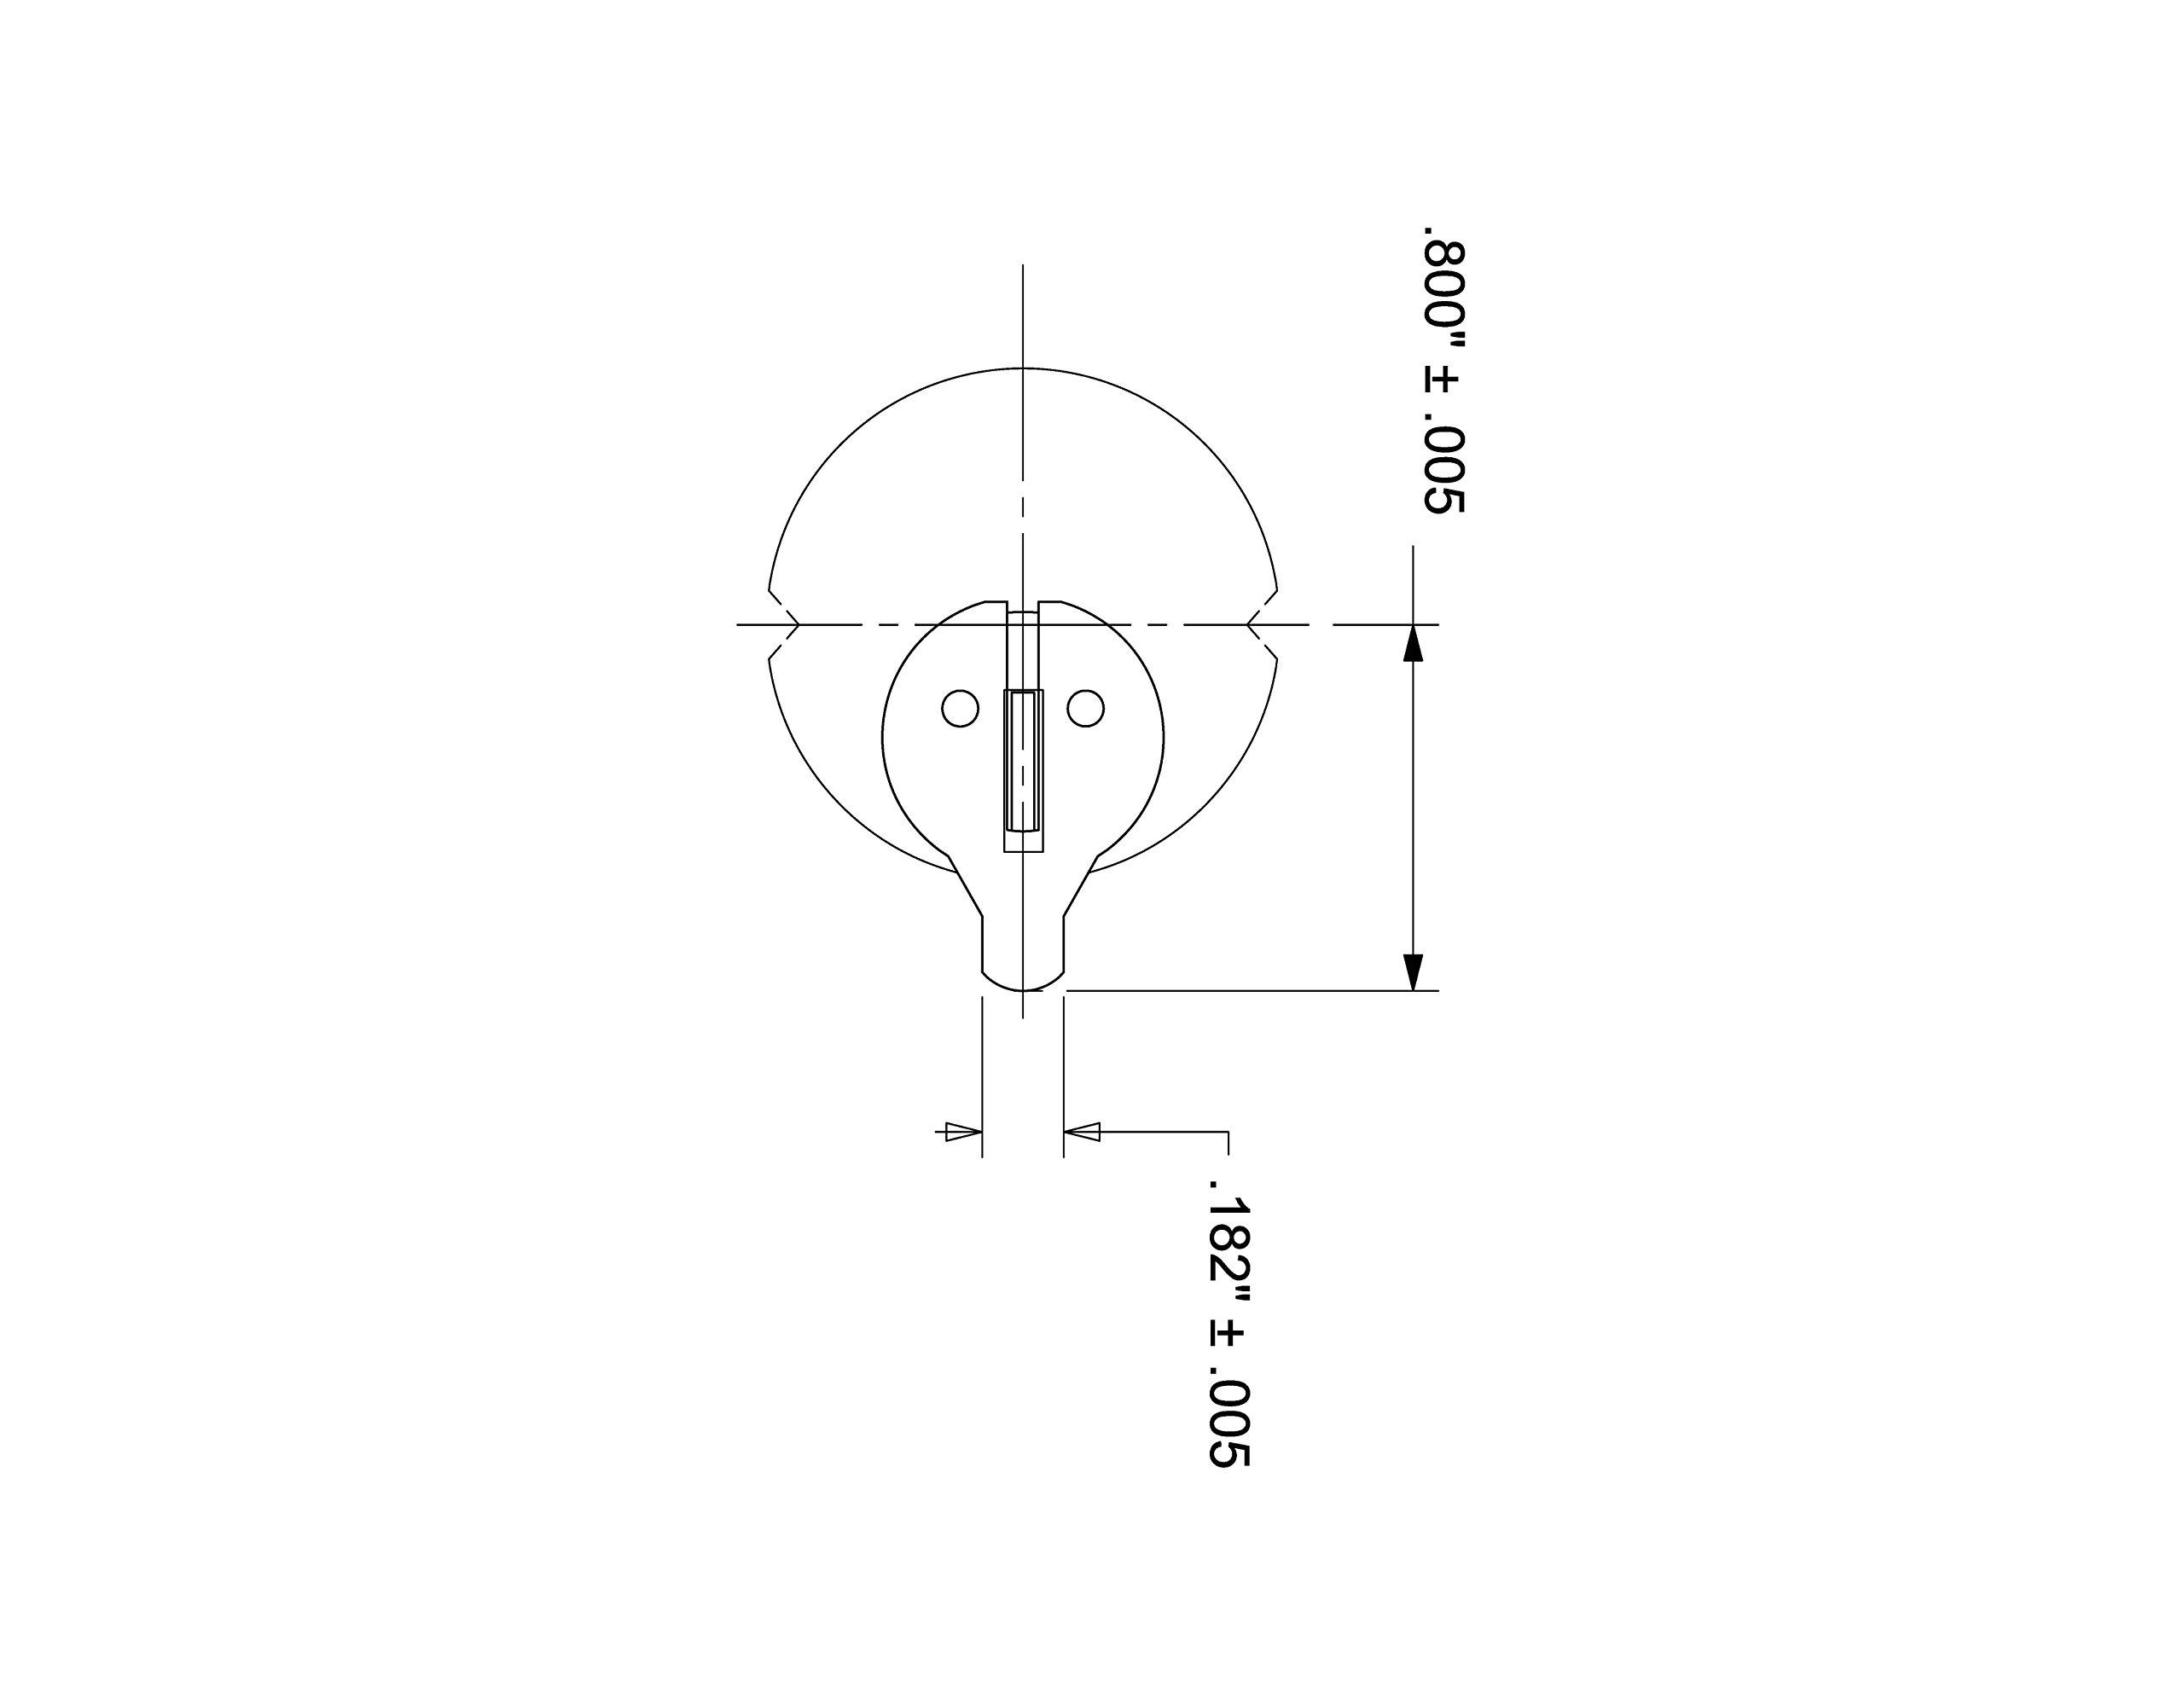 Mortise Keyed Cylinder Lock in Aluminum finish - KA per pair, sold in pair, keyed alike, SC1 keyway. 1-5/32 inch diameter mortise cylinder.